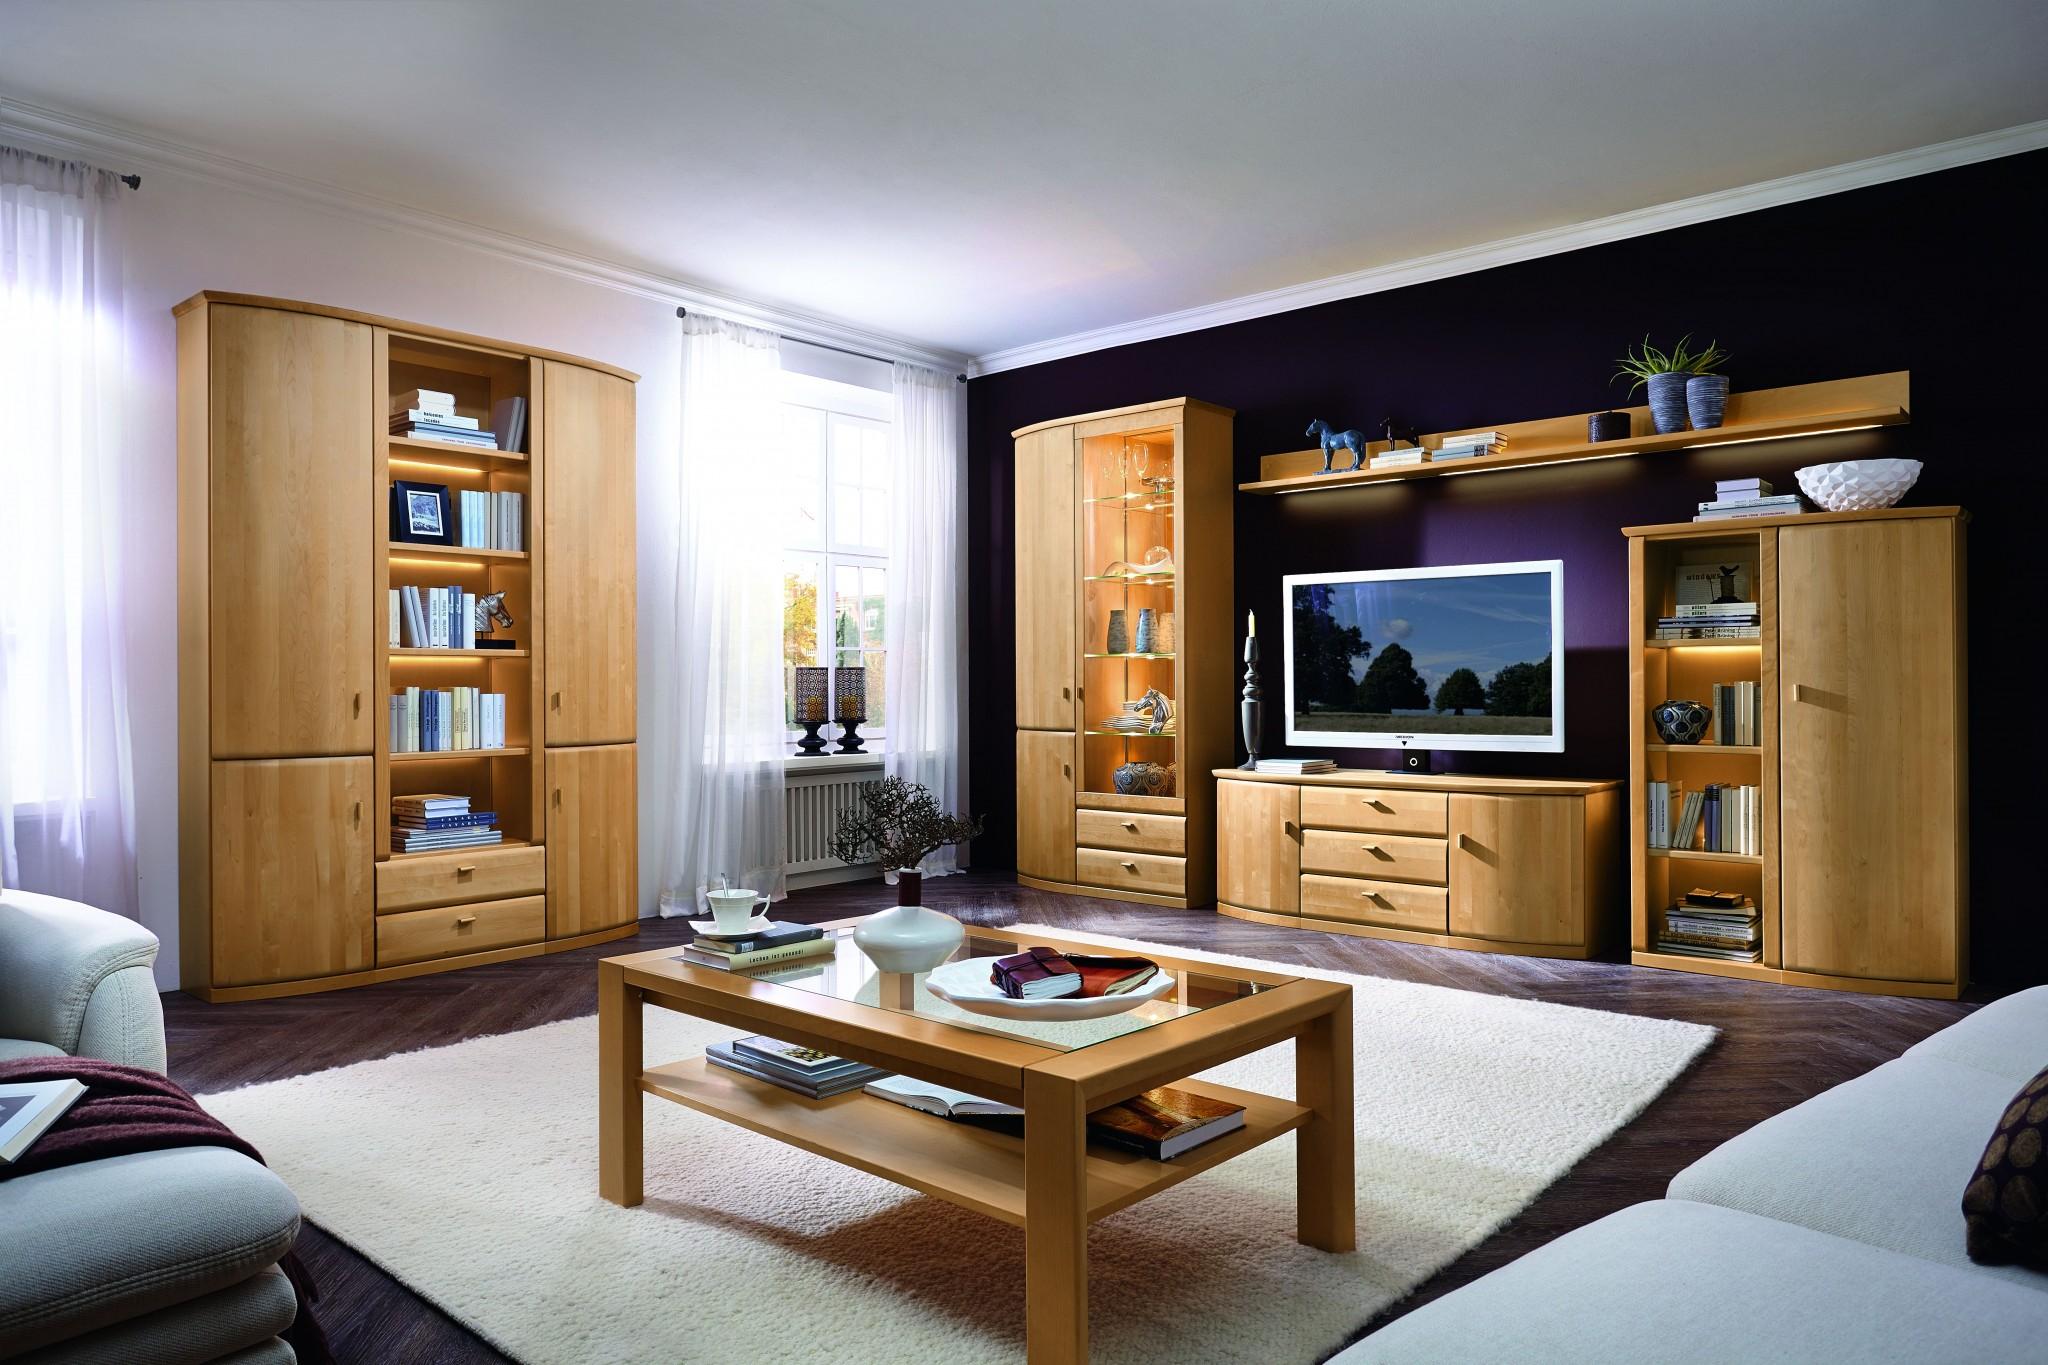 wohnwandprogramm ricardo in kernesche teilmassiv m bel polt m belhaus. Black Bedroom Furniture Sets. Home Design Ideas